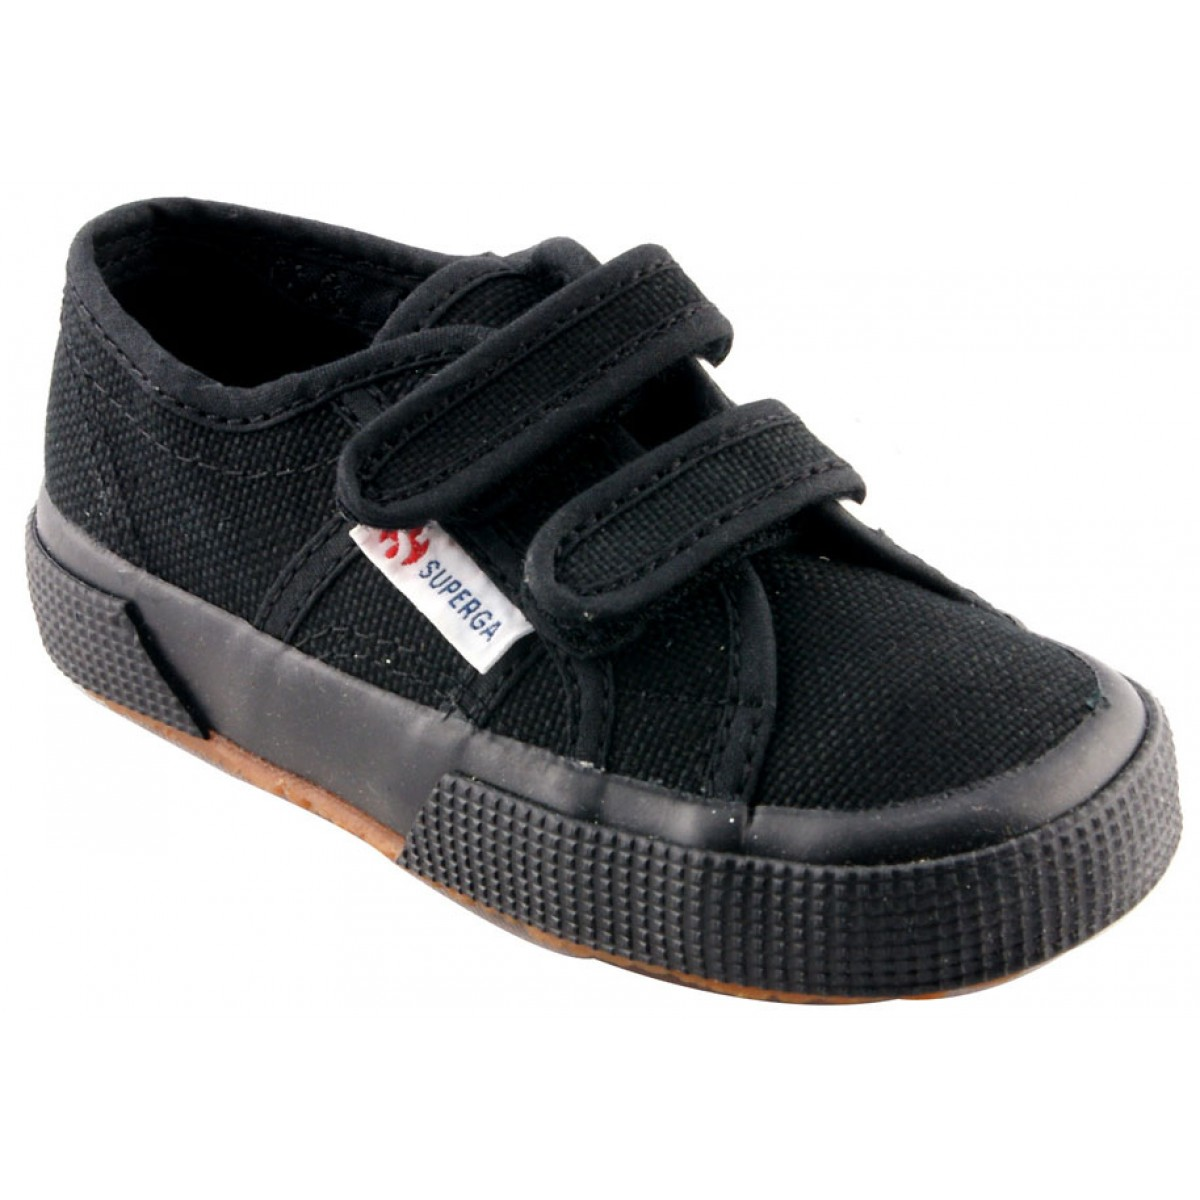 Superga Enfant 2750 Velcro -34-noir